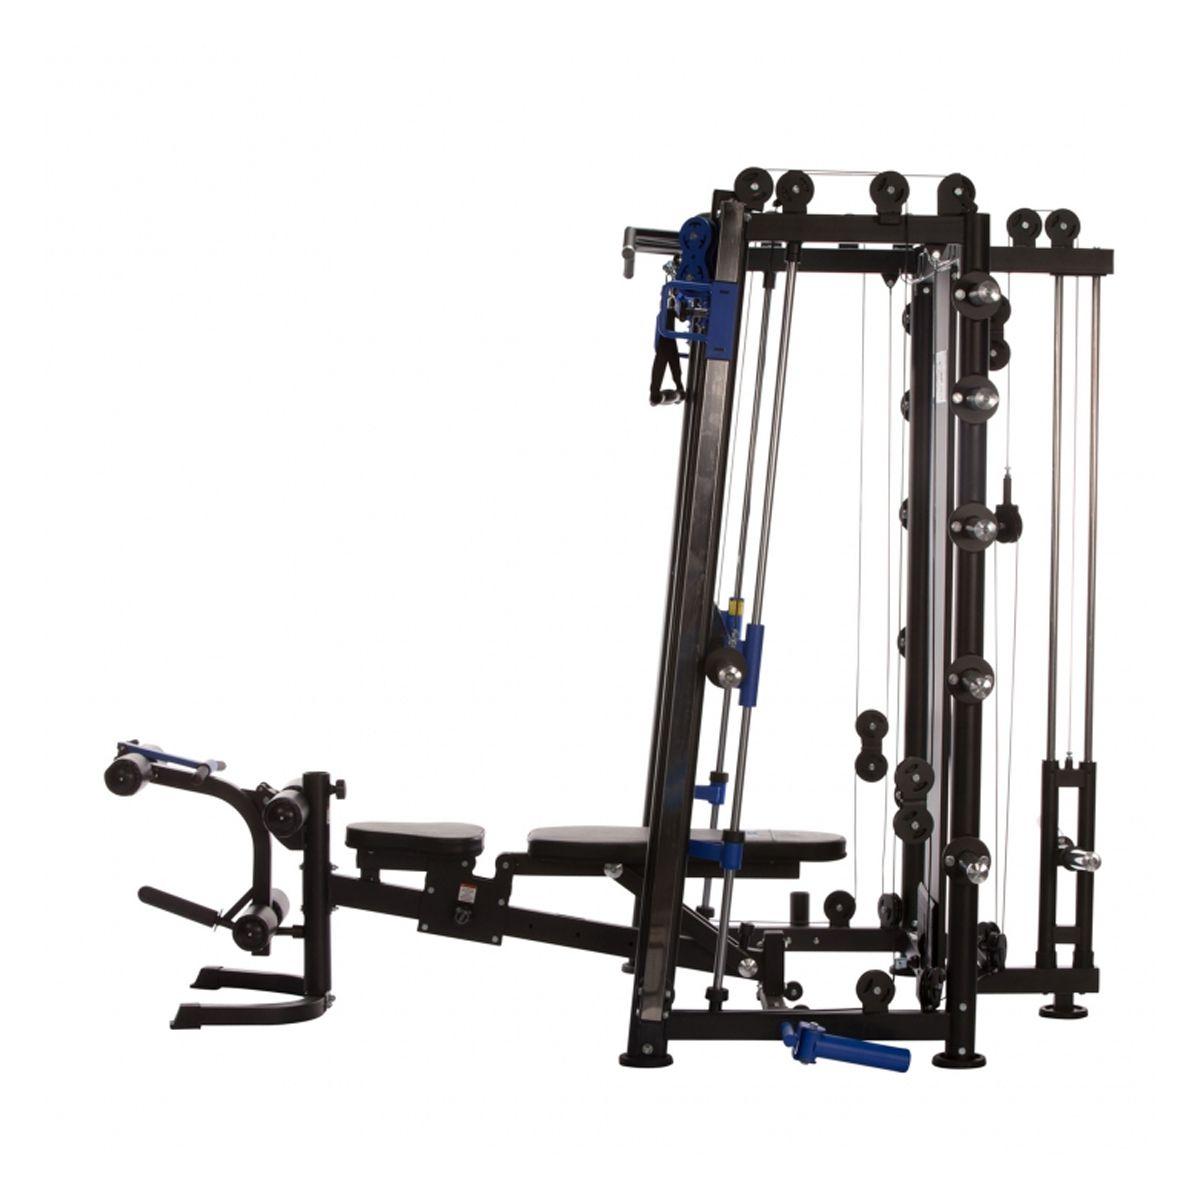 maxxus multi smith machine 10 1 100702788